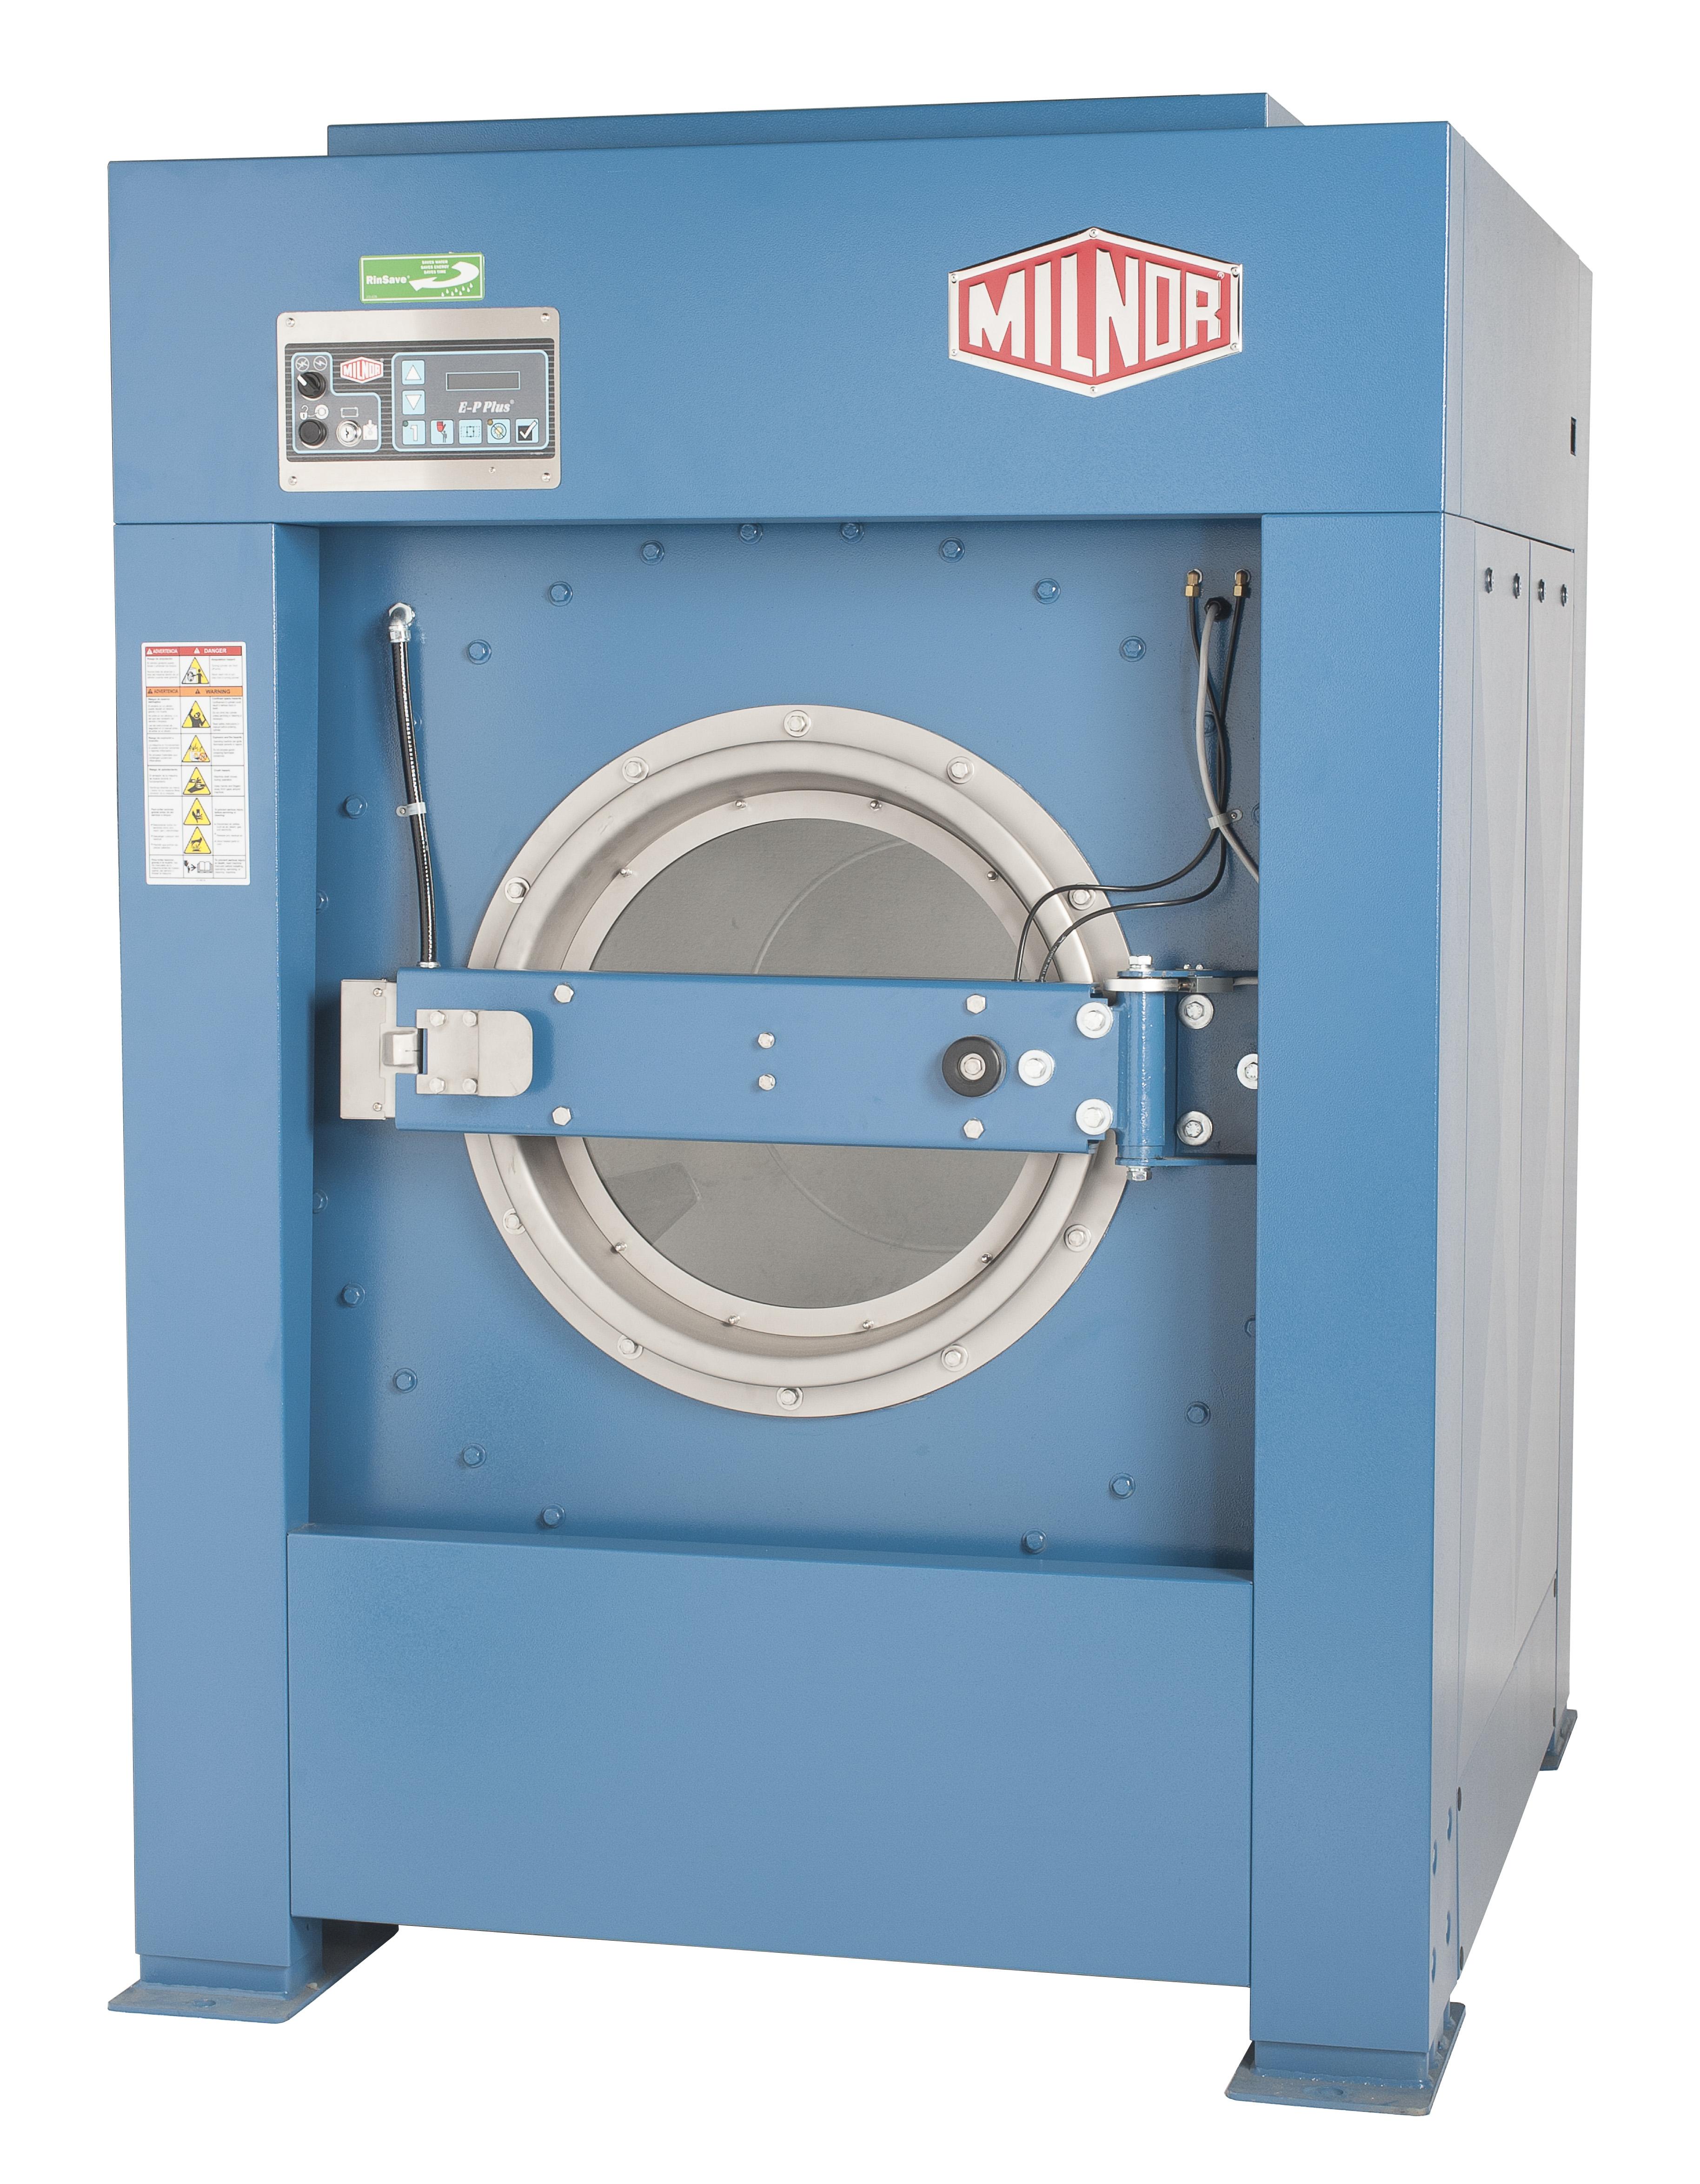 Milnor Washer Extractor ~ Mwf j pellerin milnor corporation